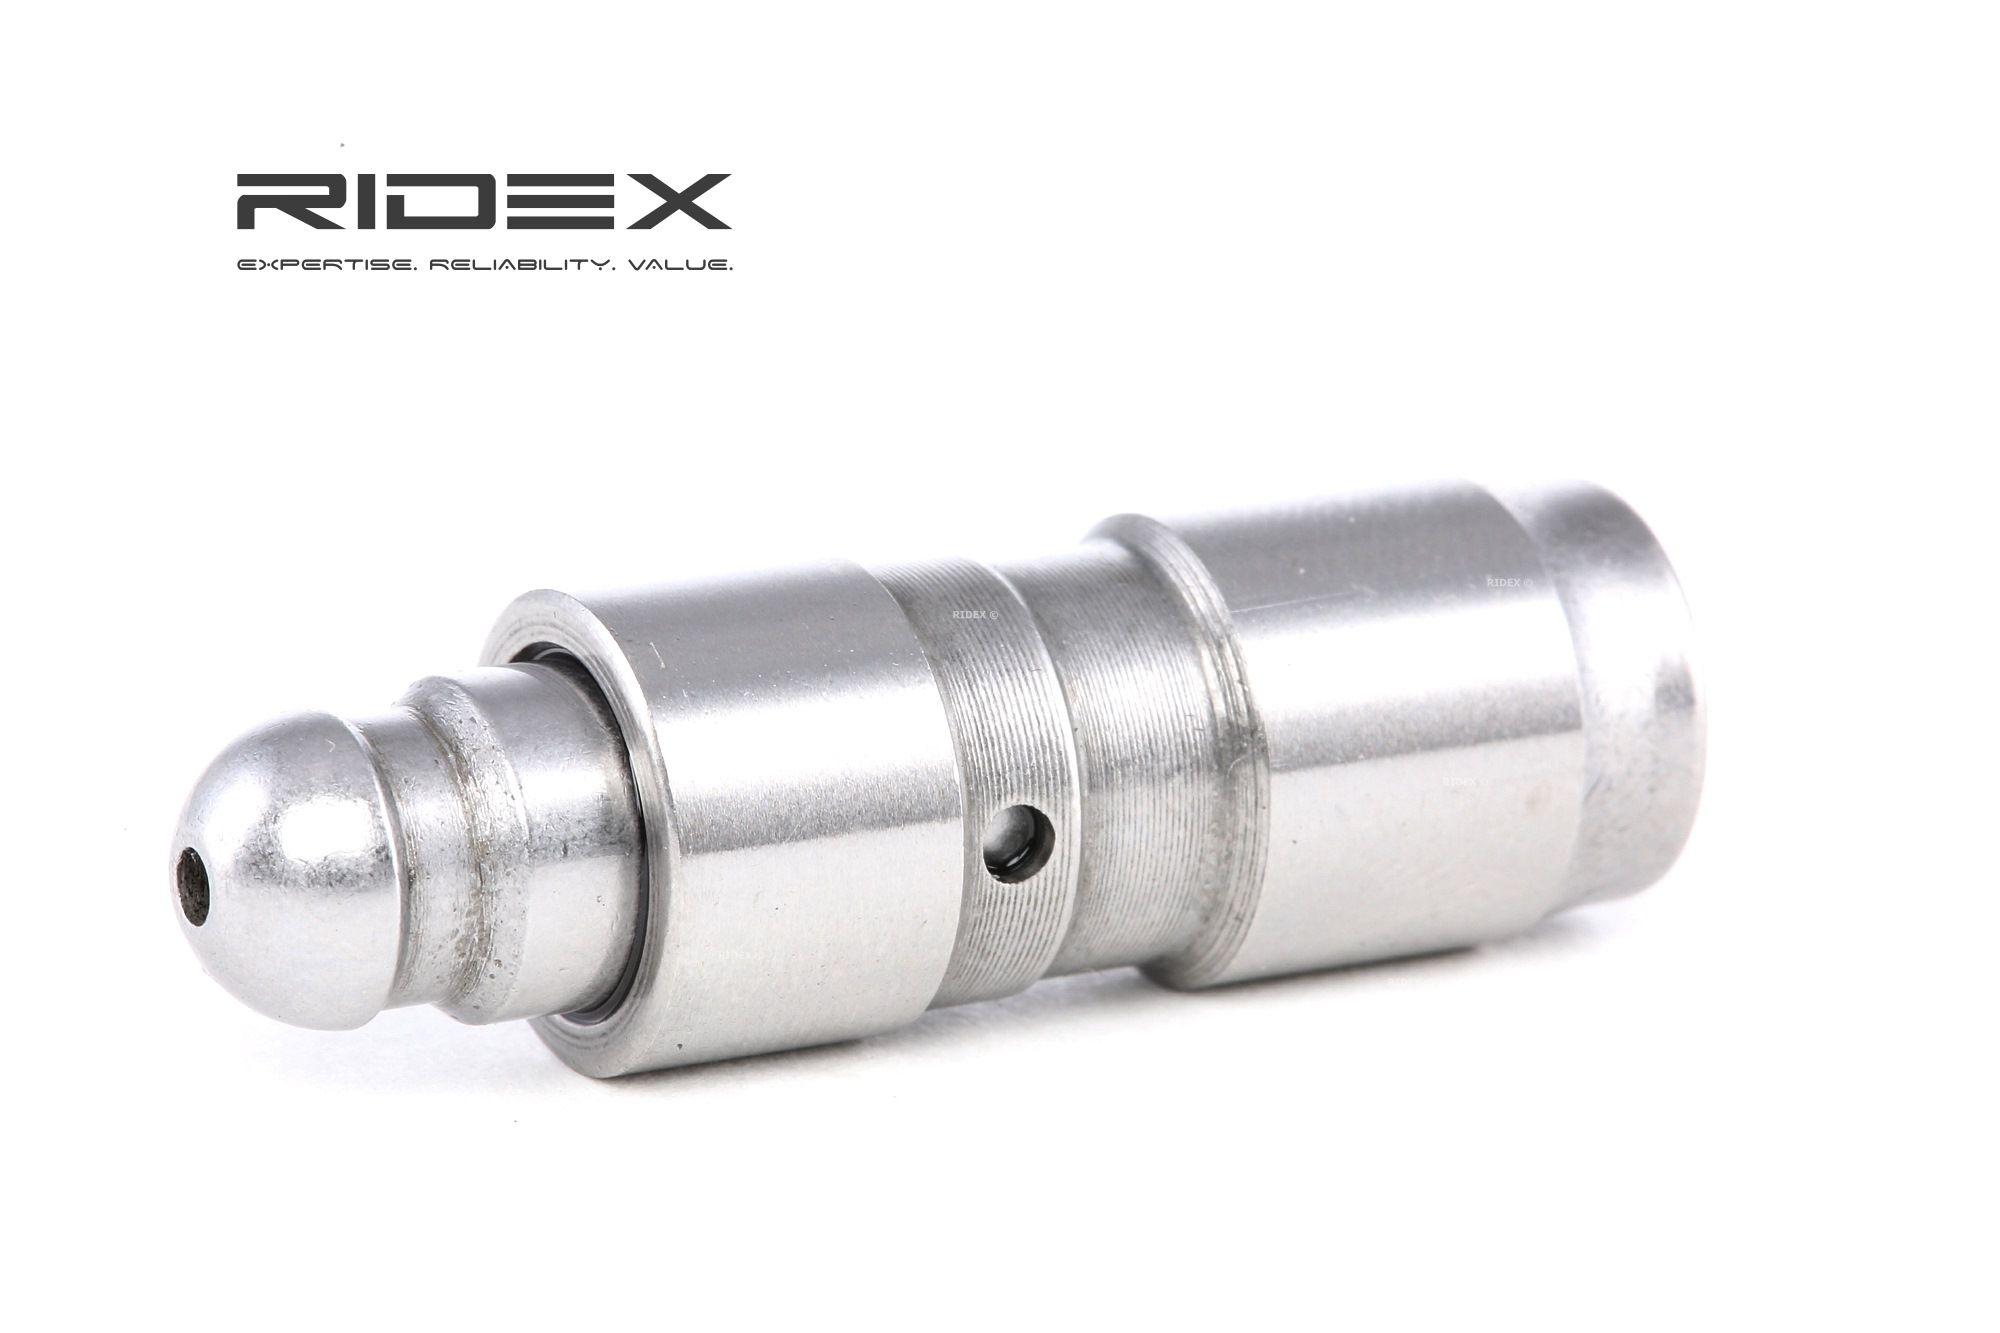 Stößel RIDEX 1216R0031 Bewertung